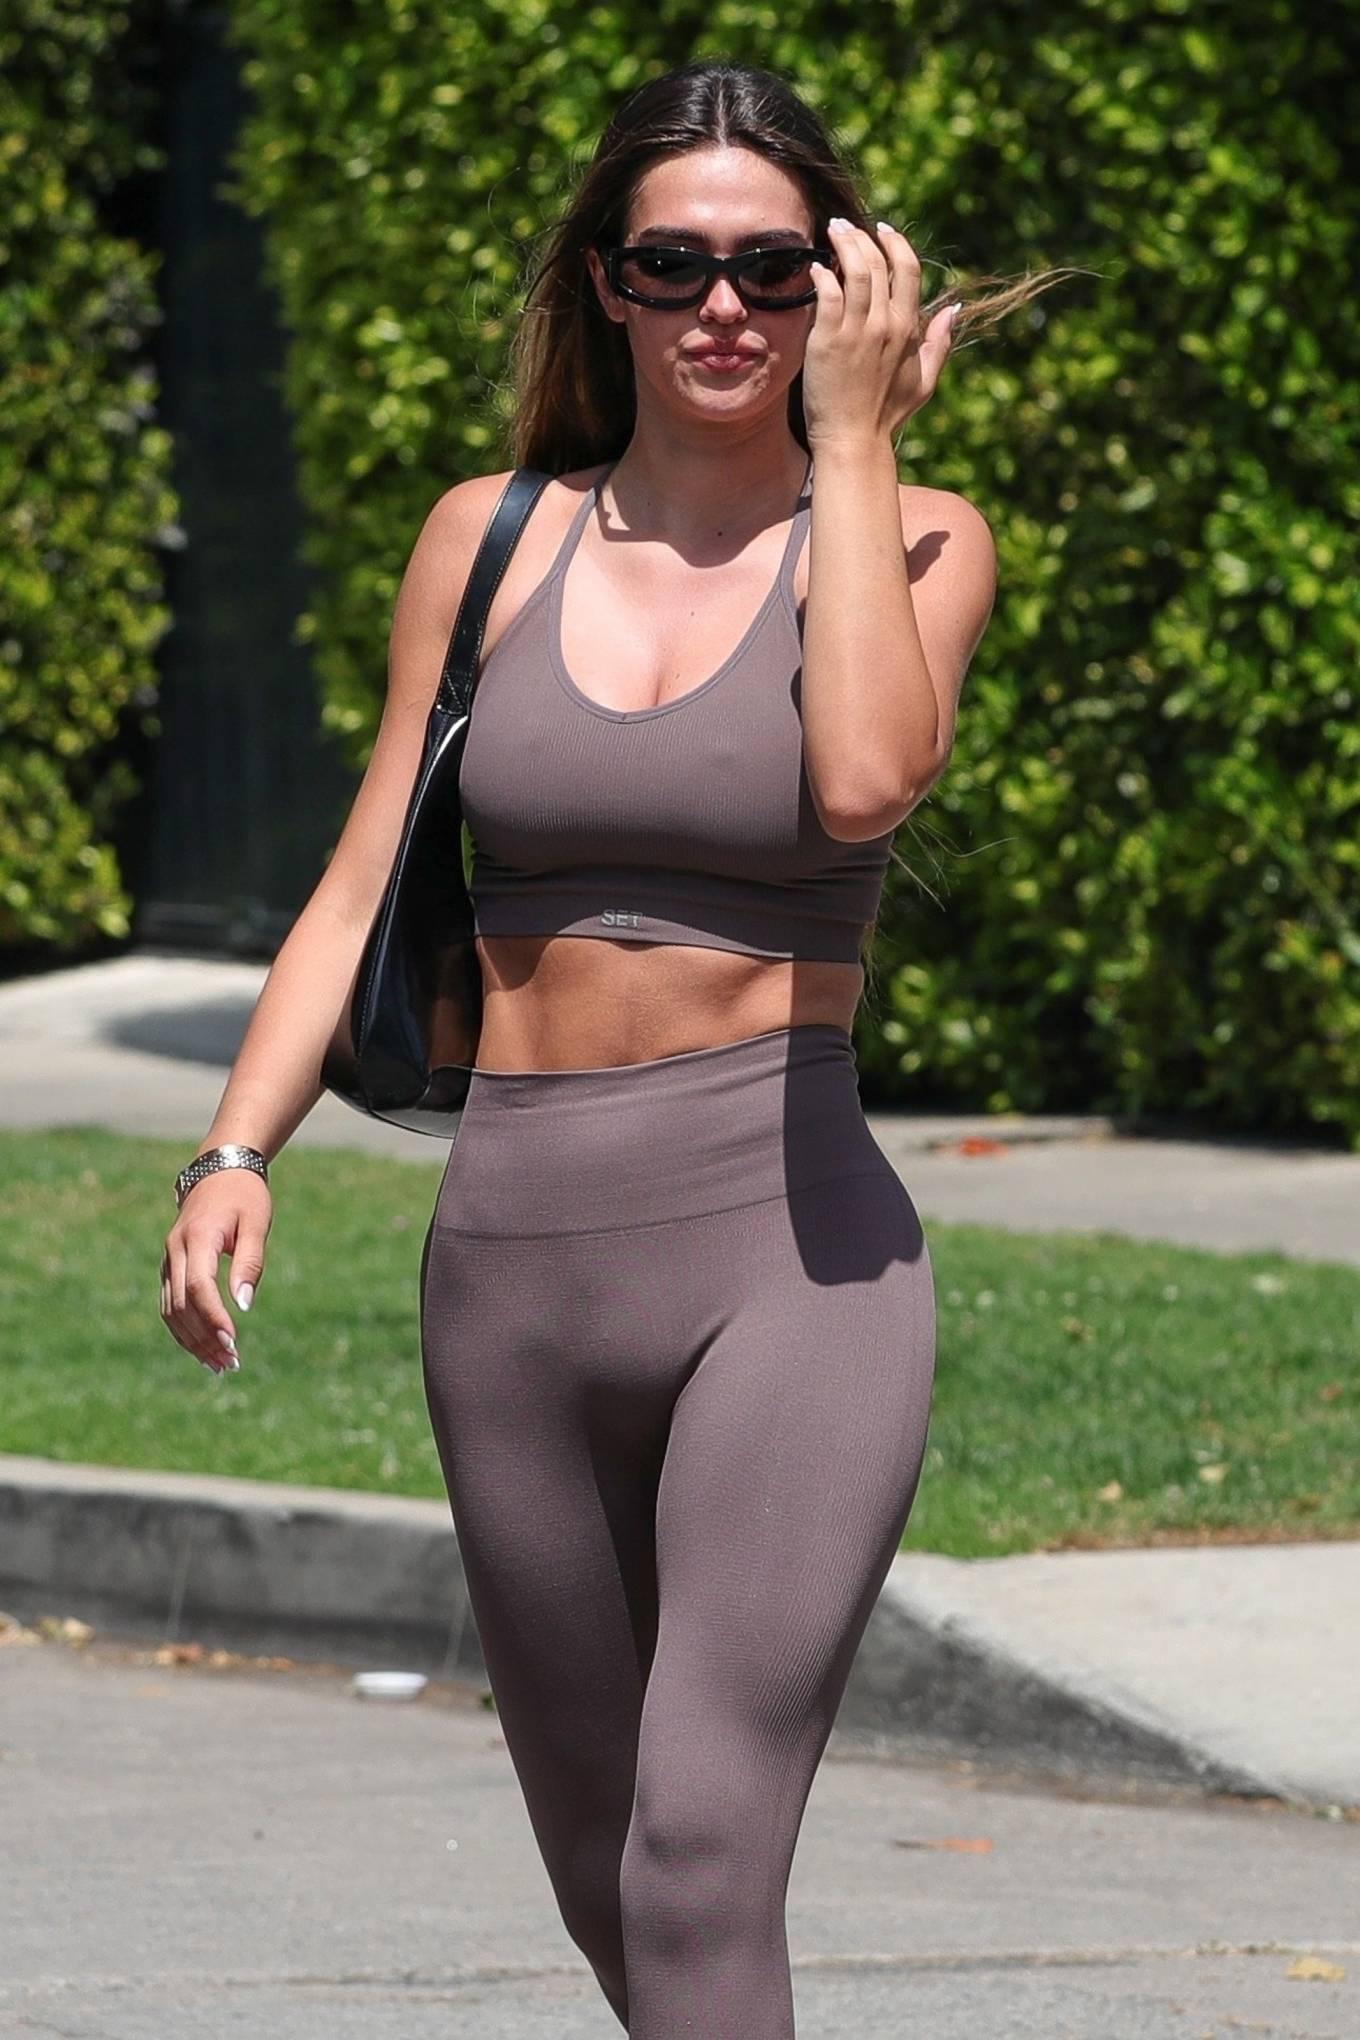 Amelia Gray Hamlin 2021 : Amelia Gray Hamlin – In SETactive workout wear and Yeezy slides in West Hollywood-14